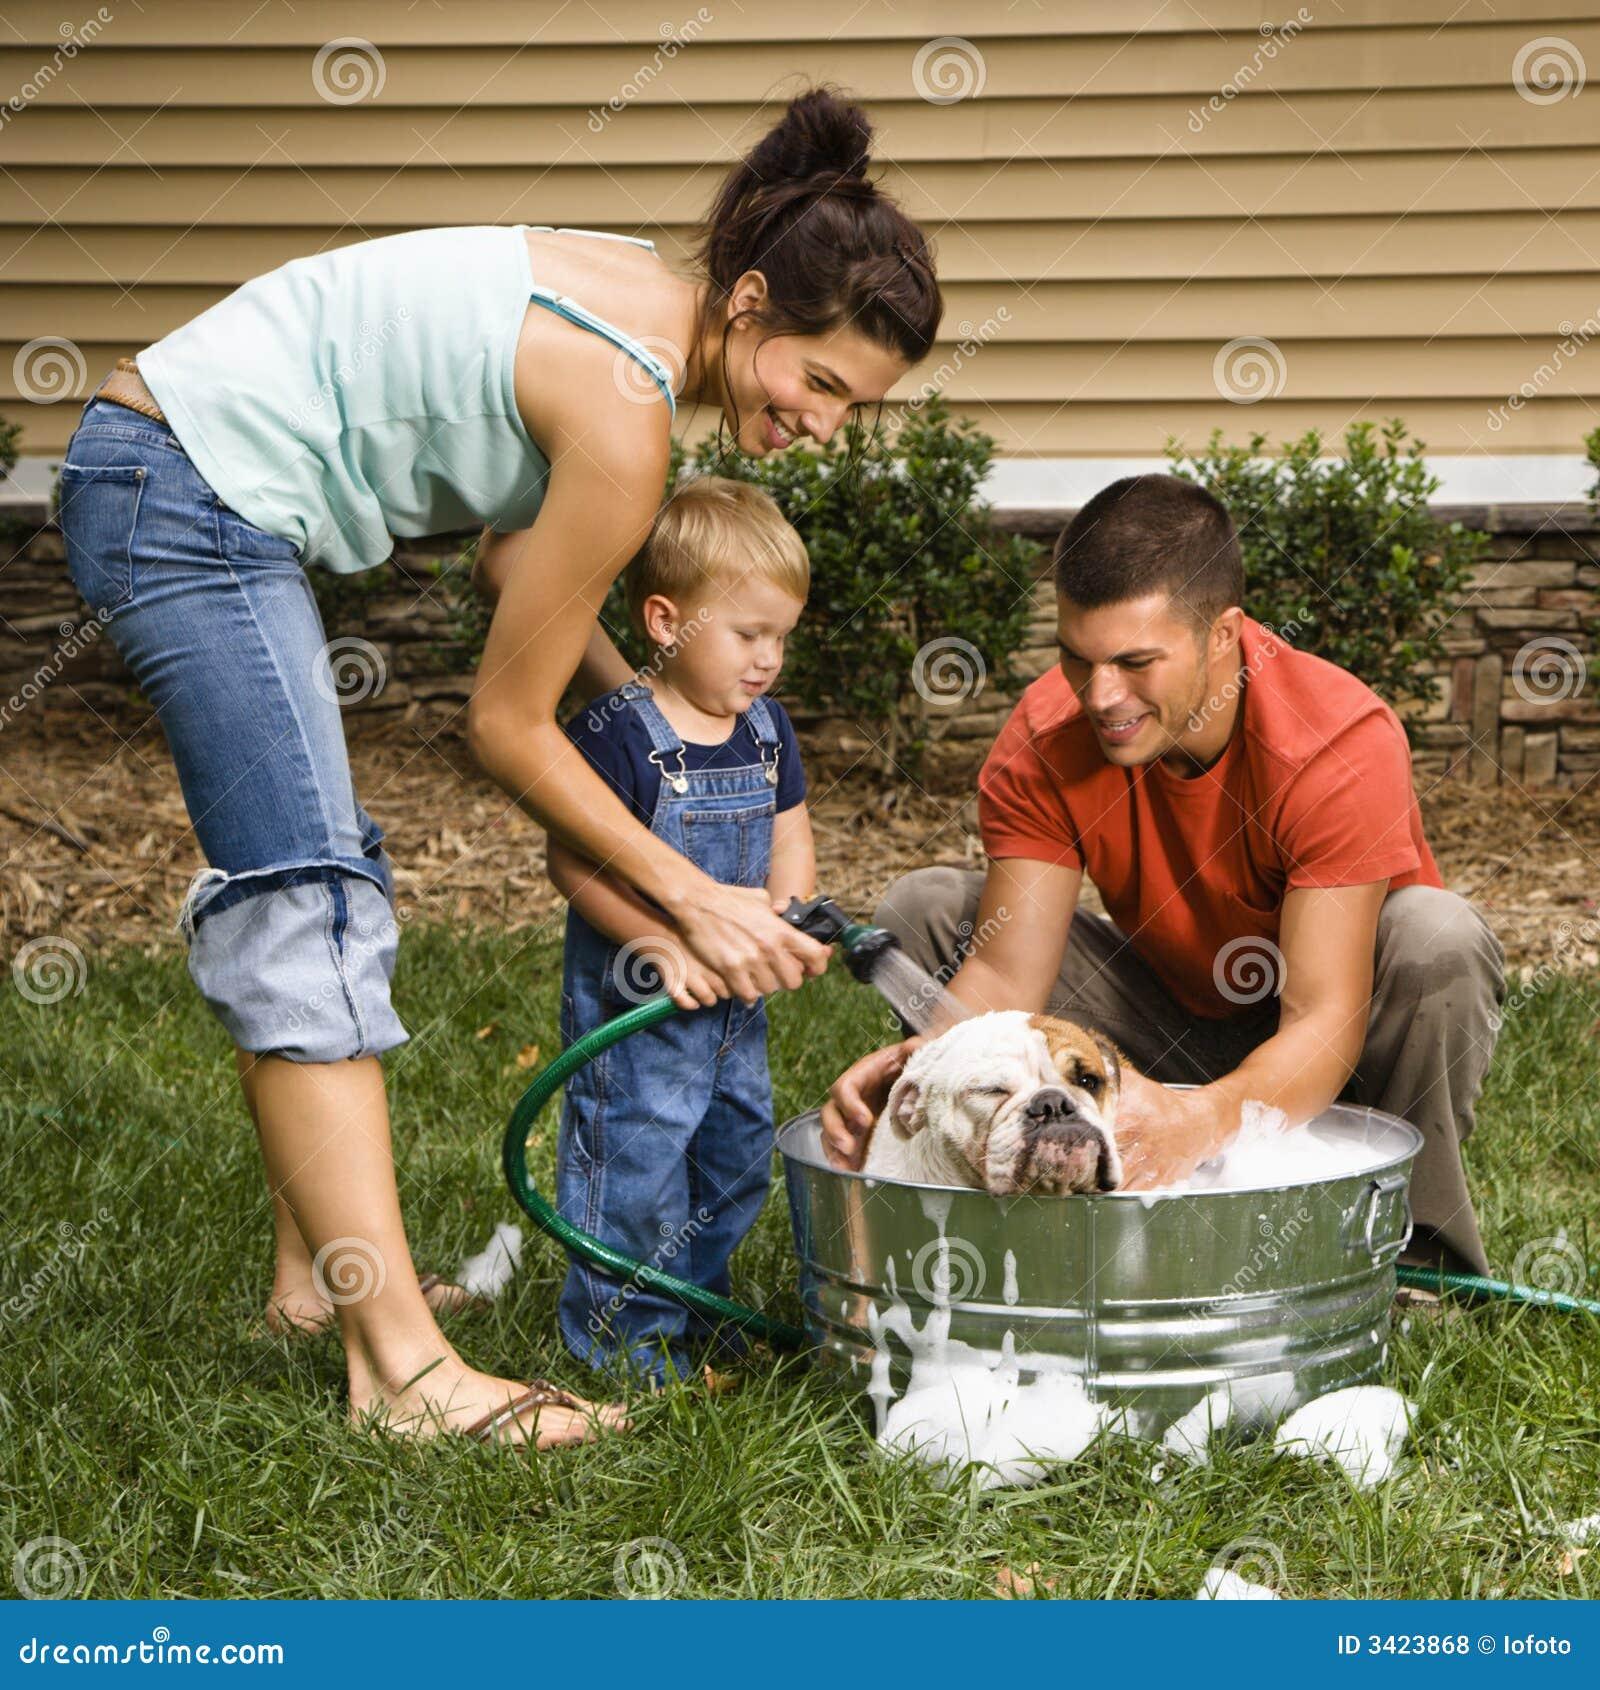 Family Giving Dog A Bath. Stock Photo. Image Of Baby, Bath